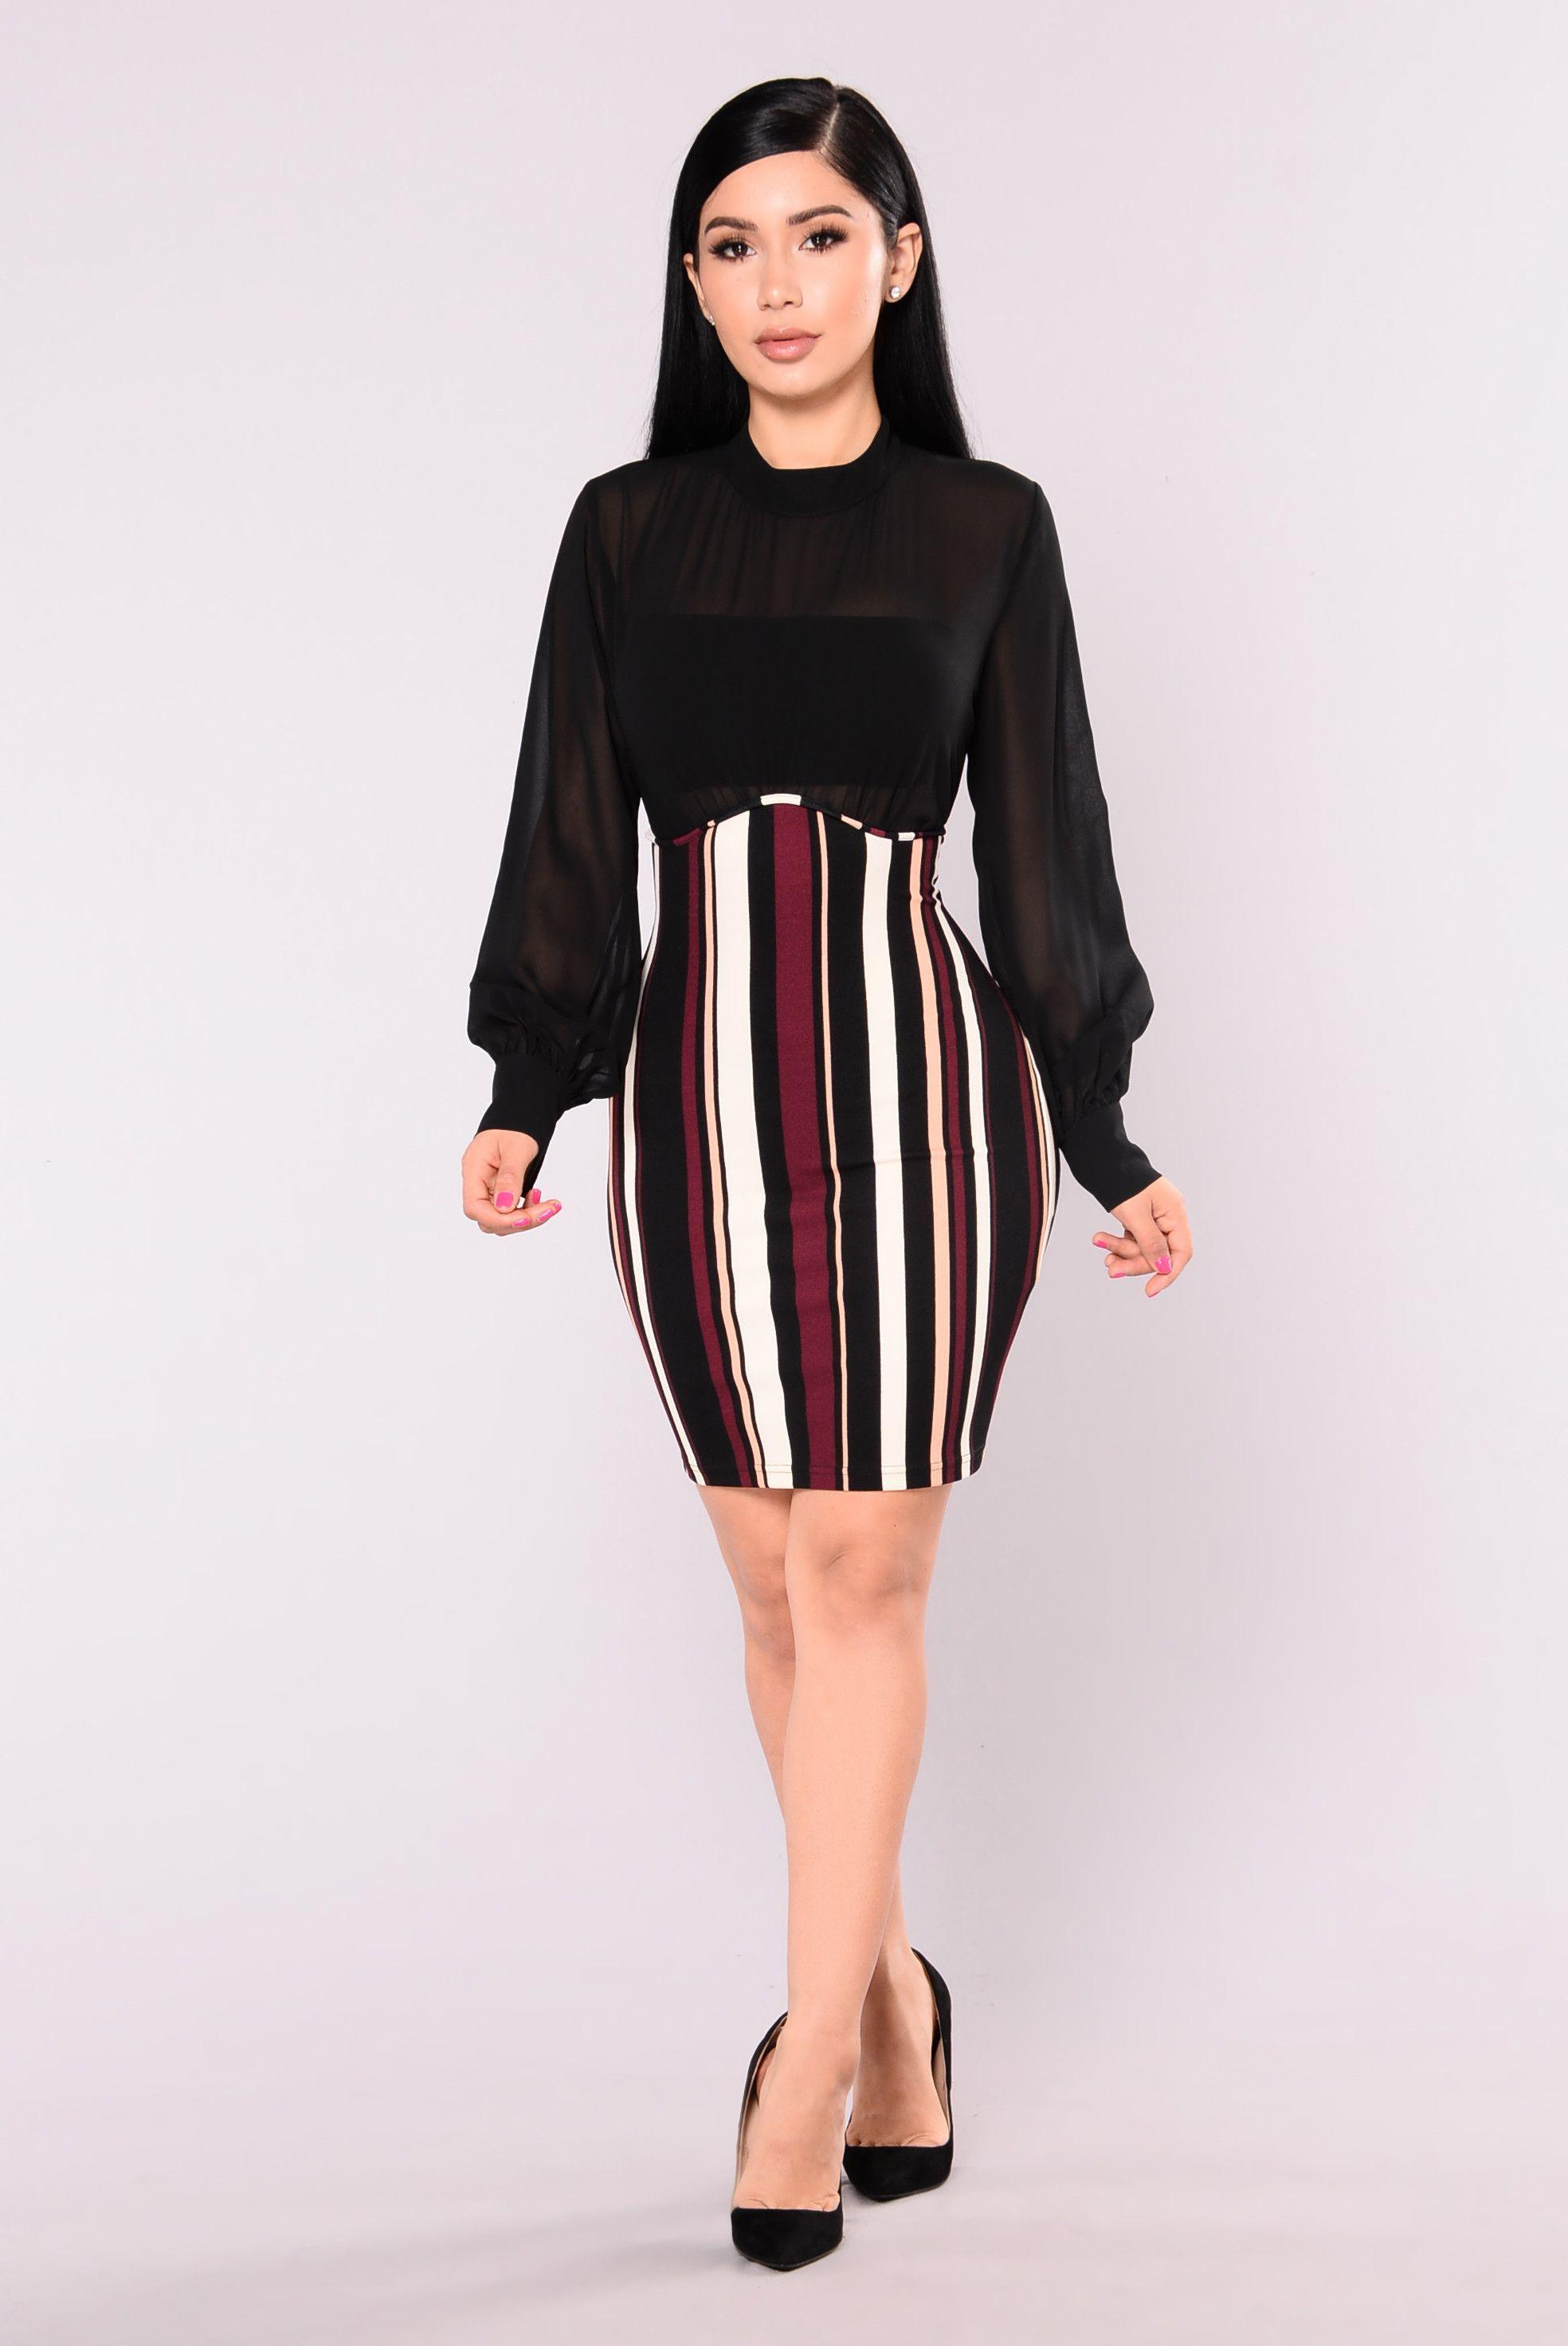 Amie Striped Dress Black Striped dress, Dresses, Fashion